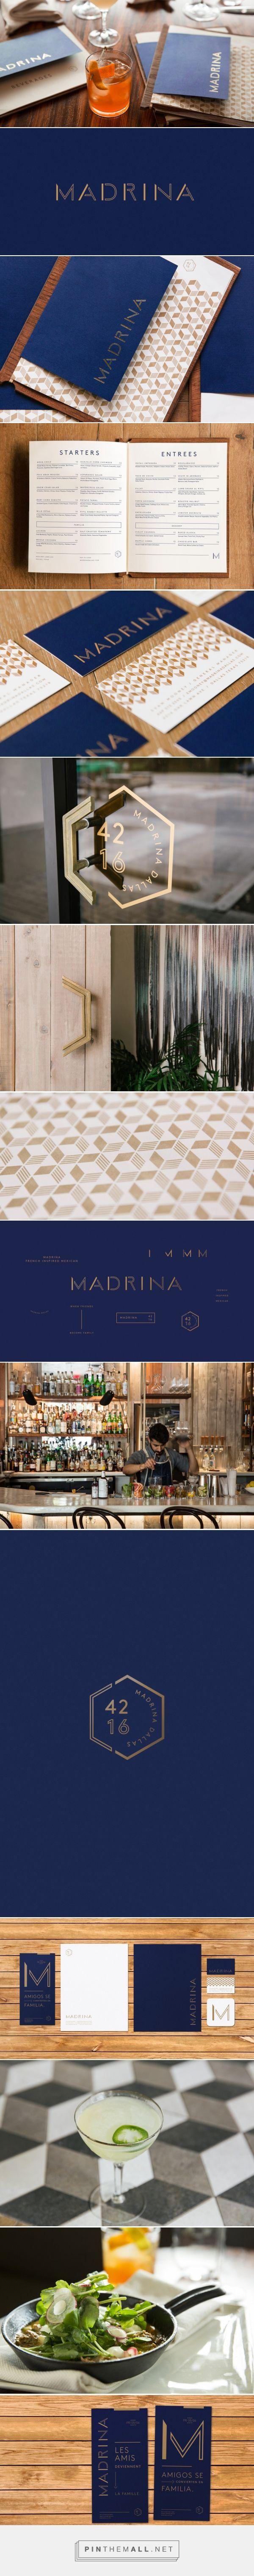 Madrina Restaurant Branding by Mast | Fivestar Branding – Design and Branding…